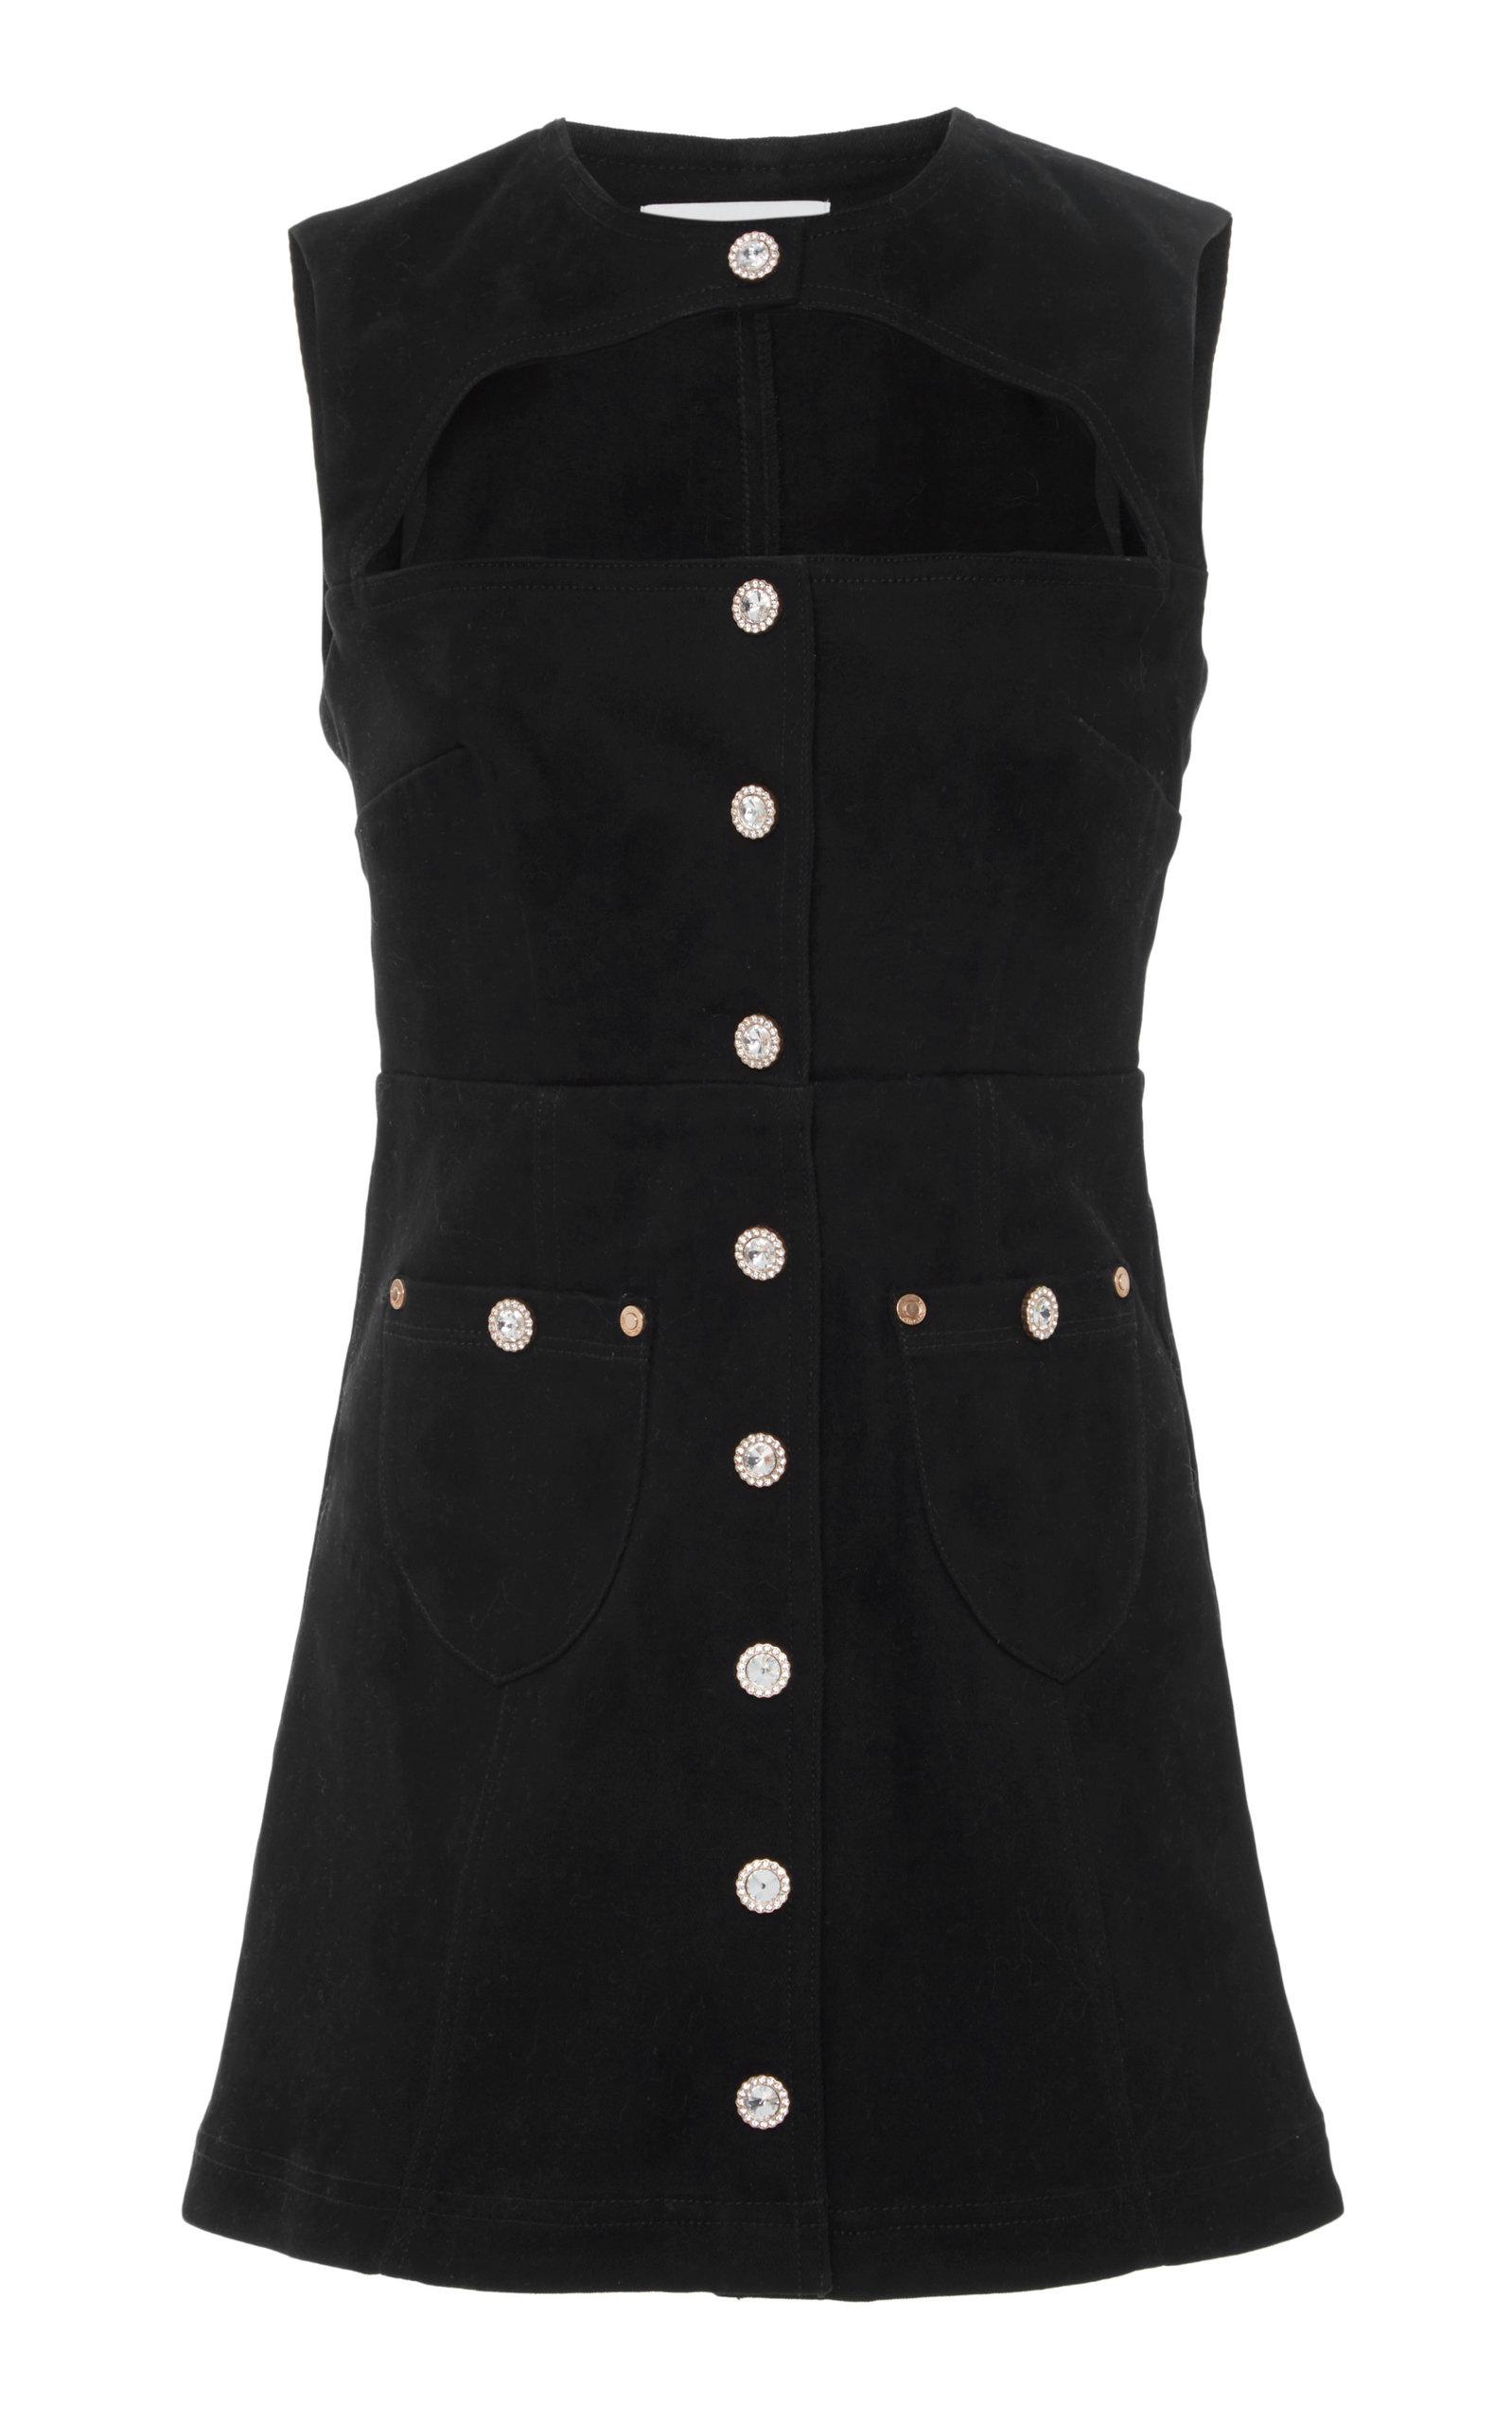 Be Mine Dress in Black